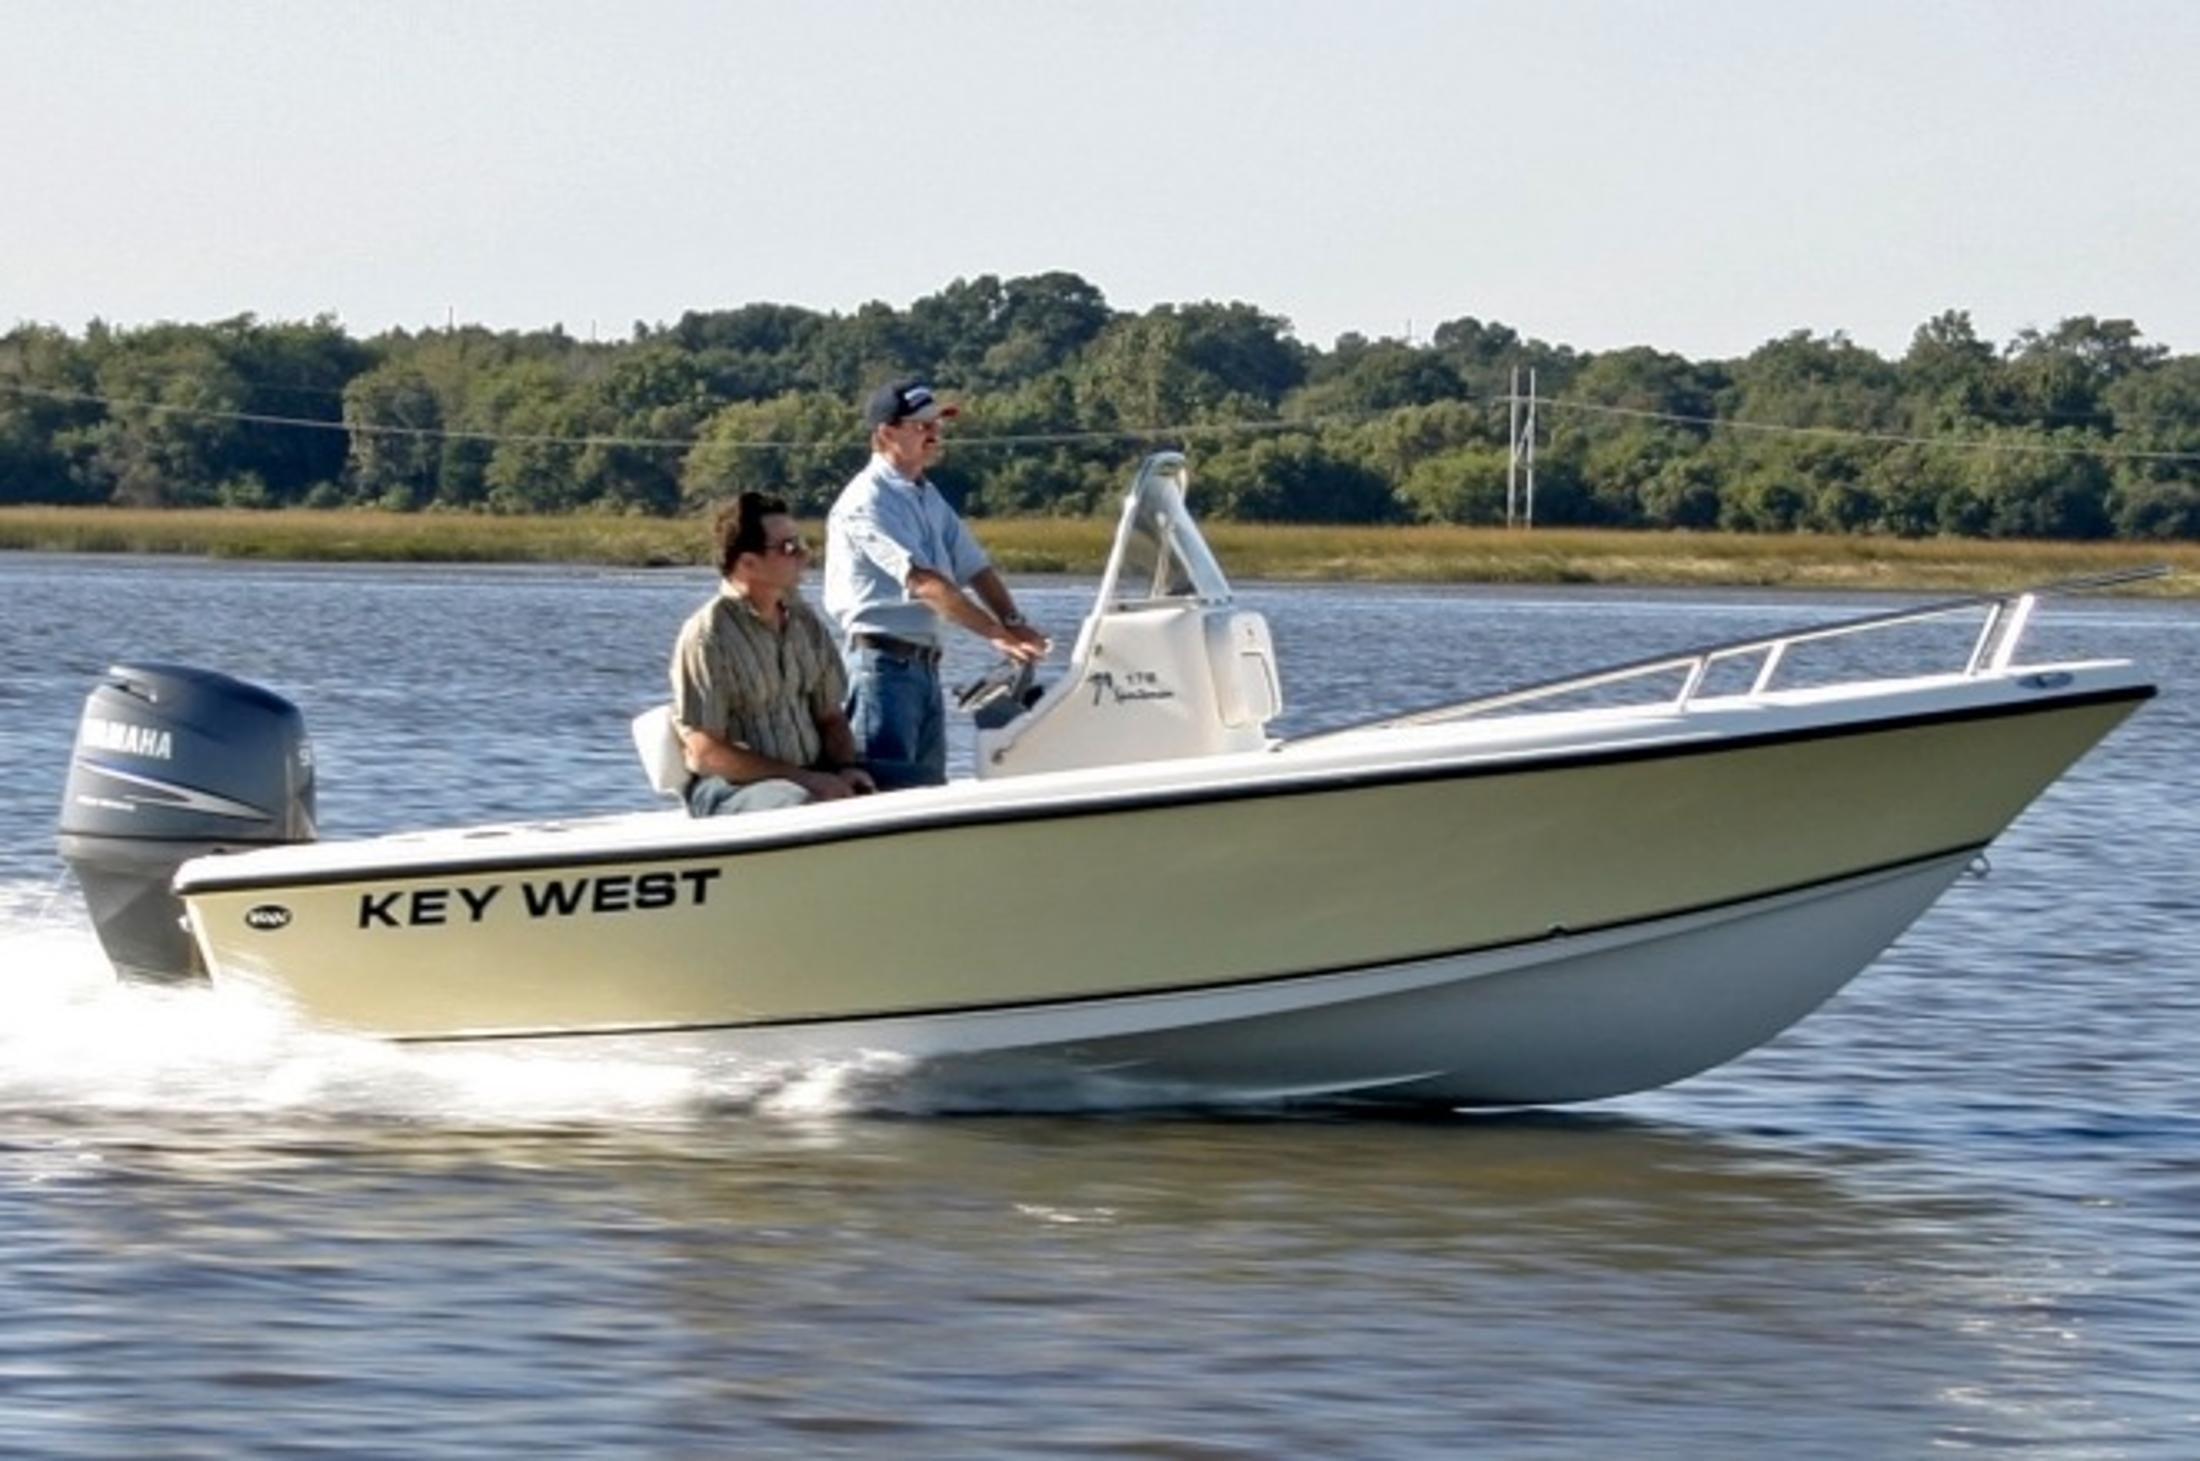 East coast yachts key essay